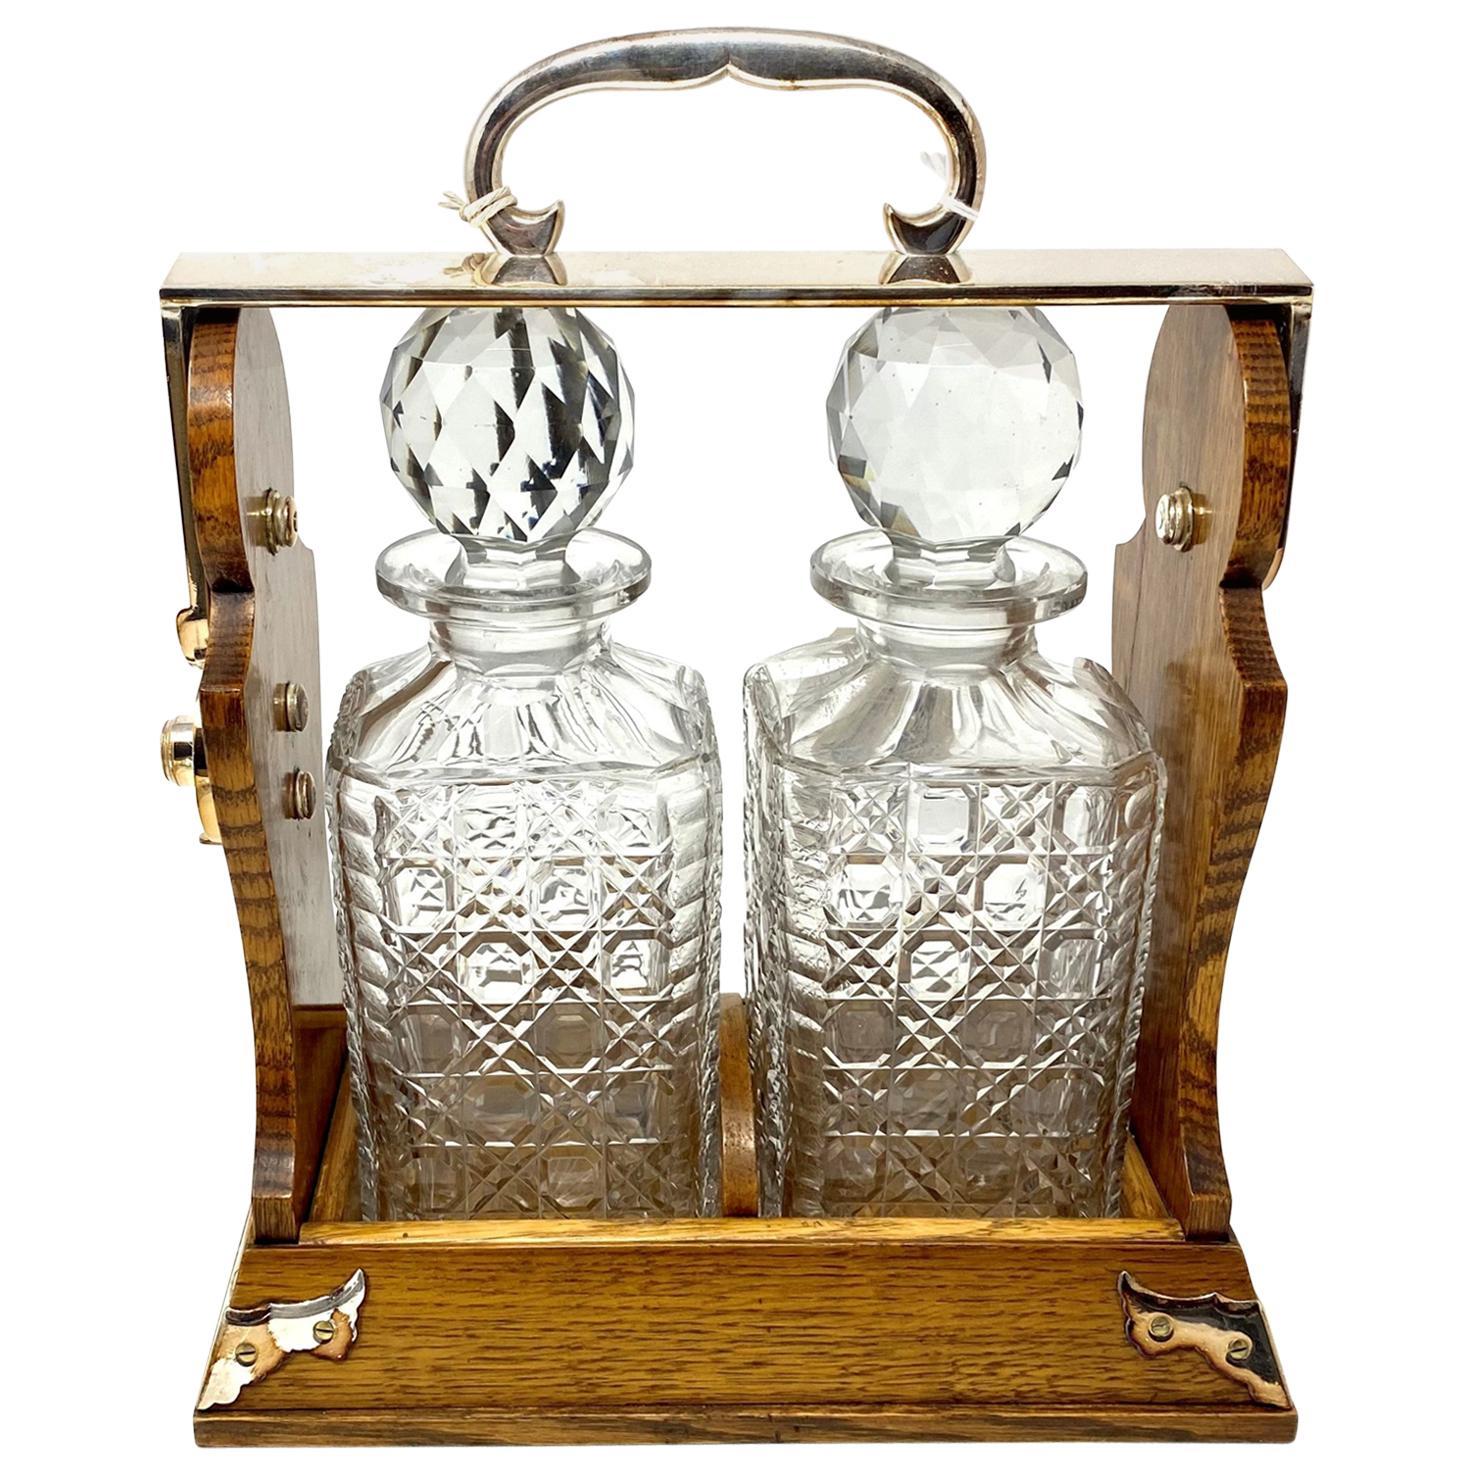 Antique English Silver Plated Golden Oak 2-Bottle Betjemann Tantalus, circa 1890